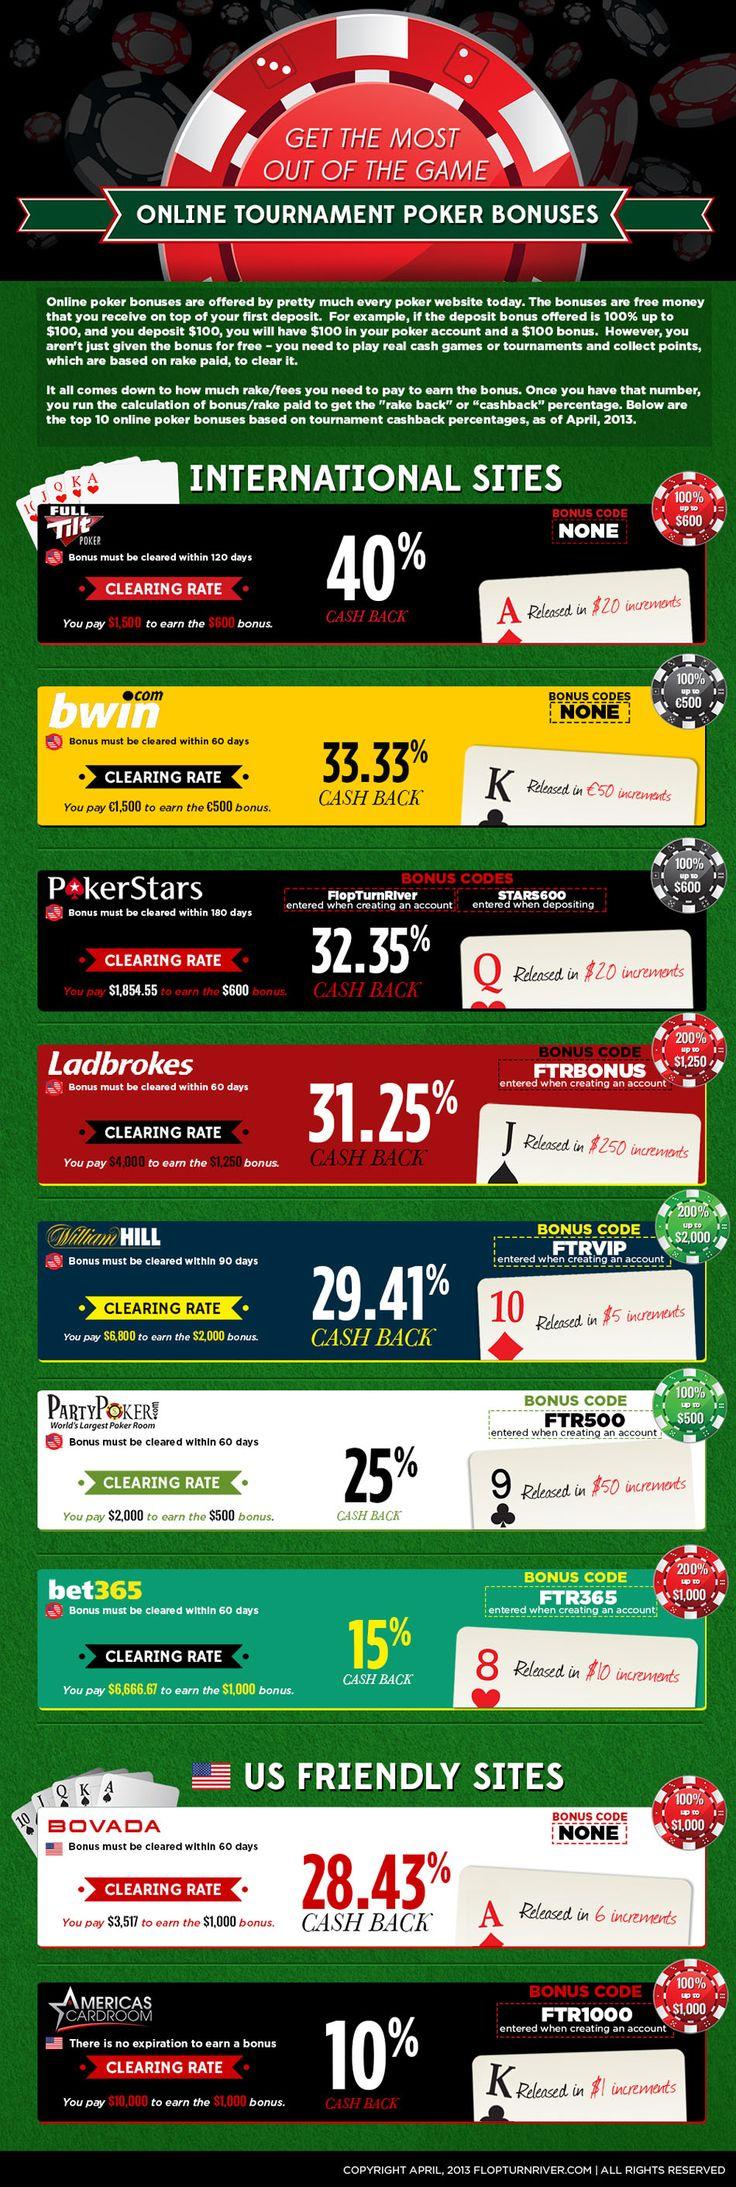 online poker tournament bonuses infographic